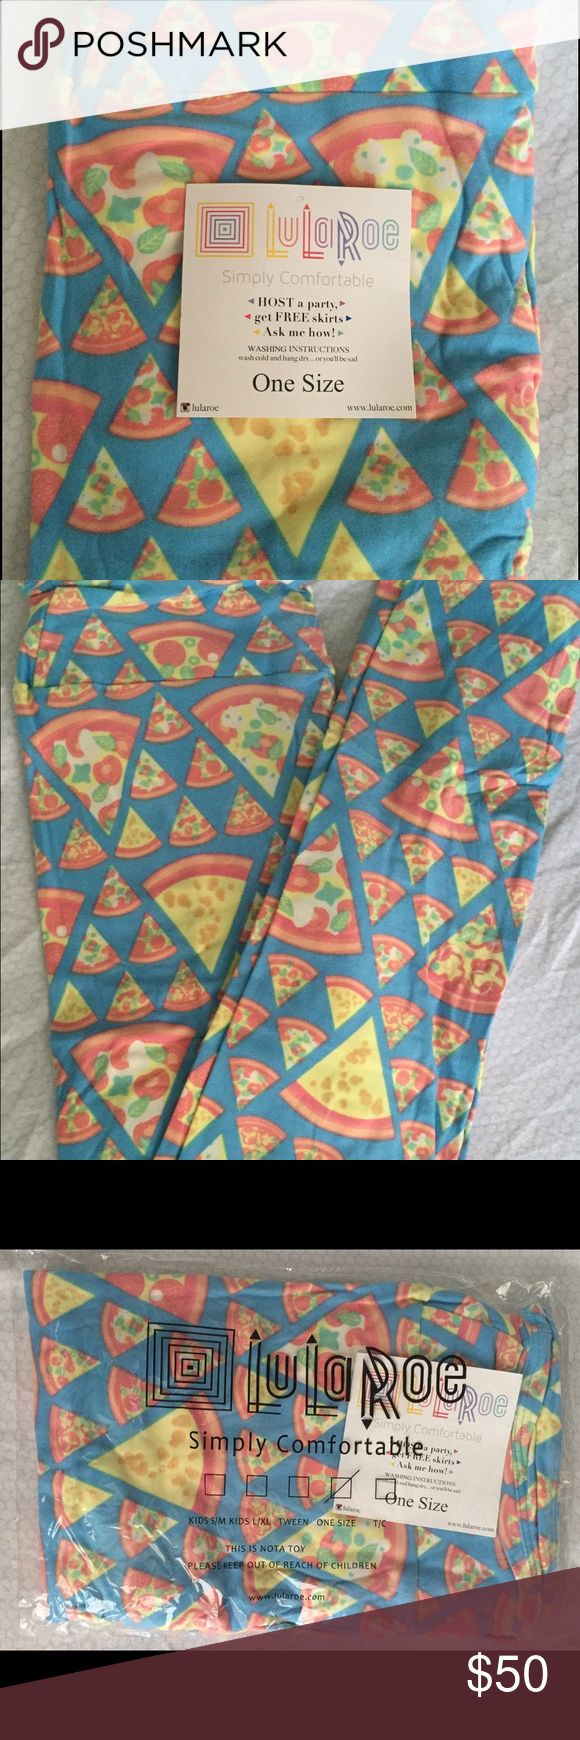 OS LuLaRoe Pizza Unicorn Leggings BNWT, HTF One Size LuLaRoe Pizza Leggings! BNWT! HTF! *UNICORN* LuLaRoe Pants Leggings